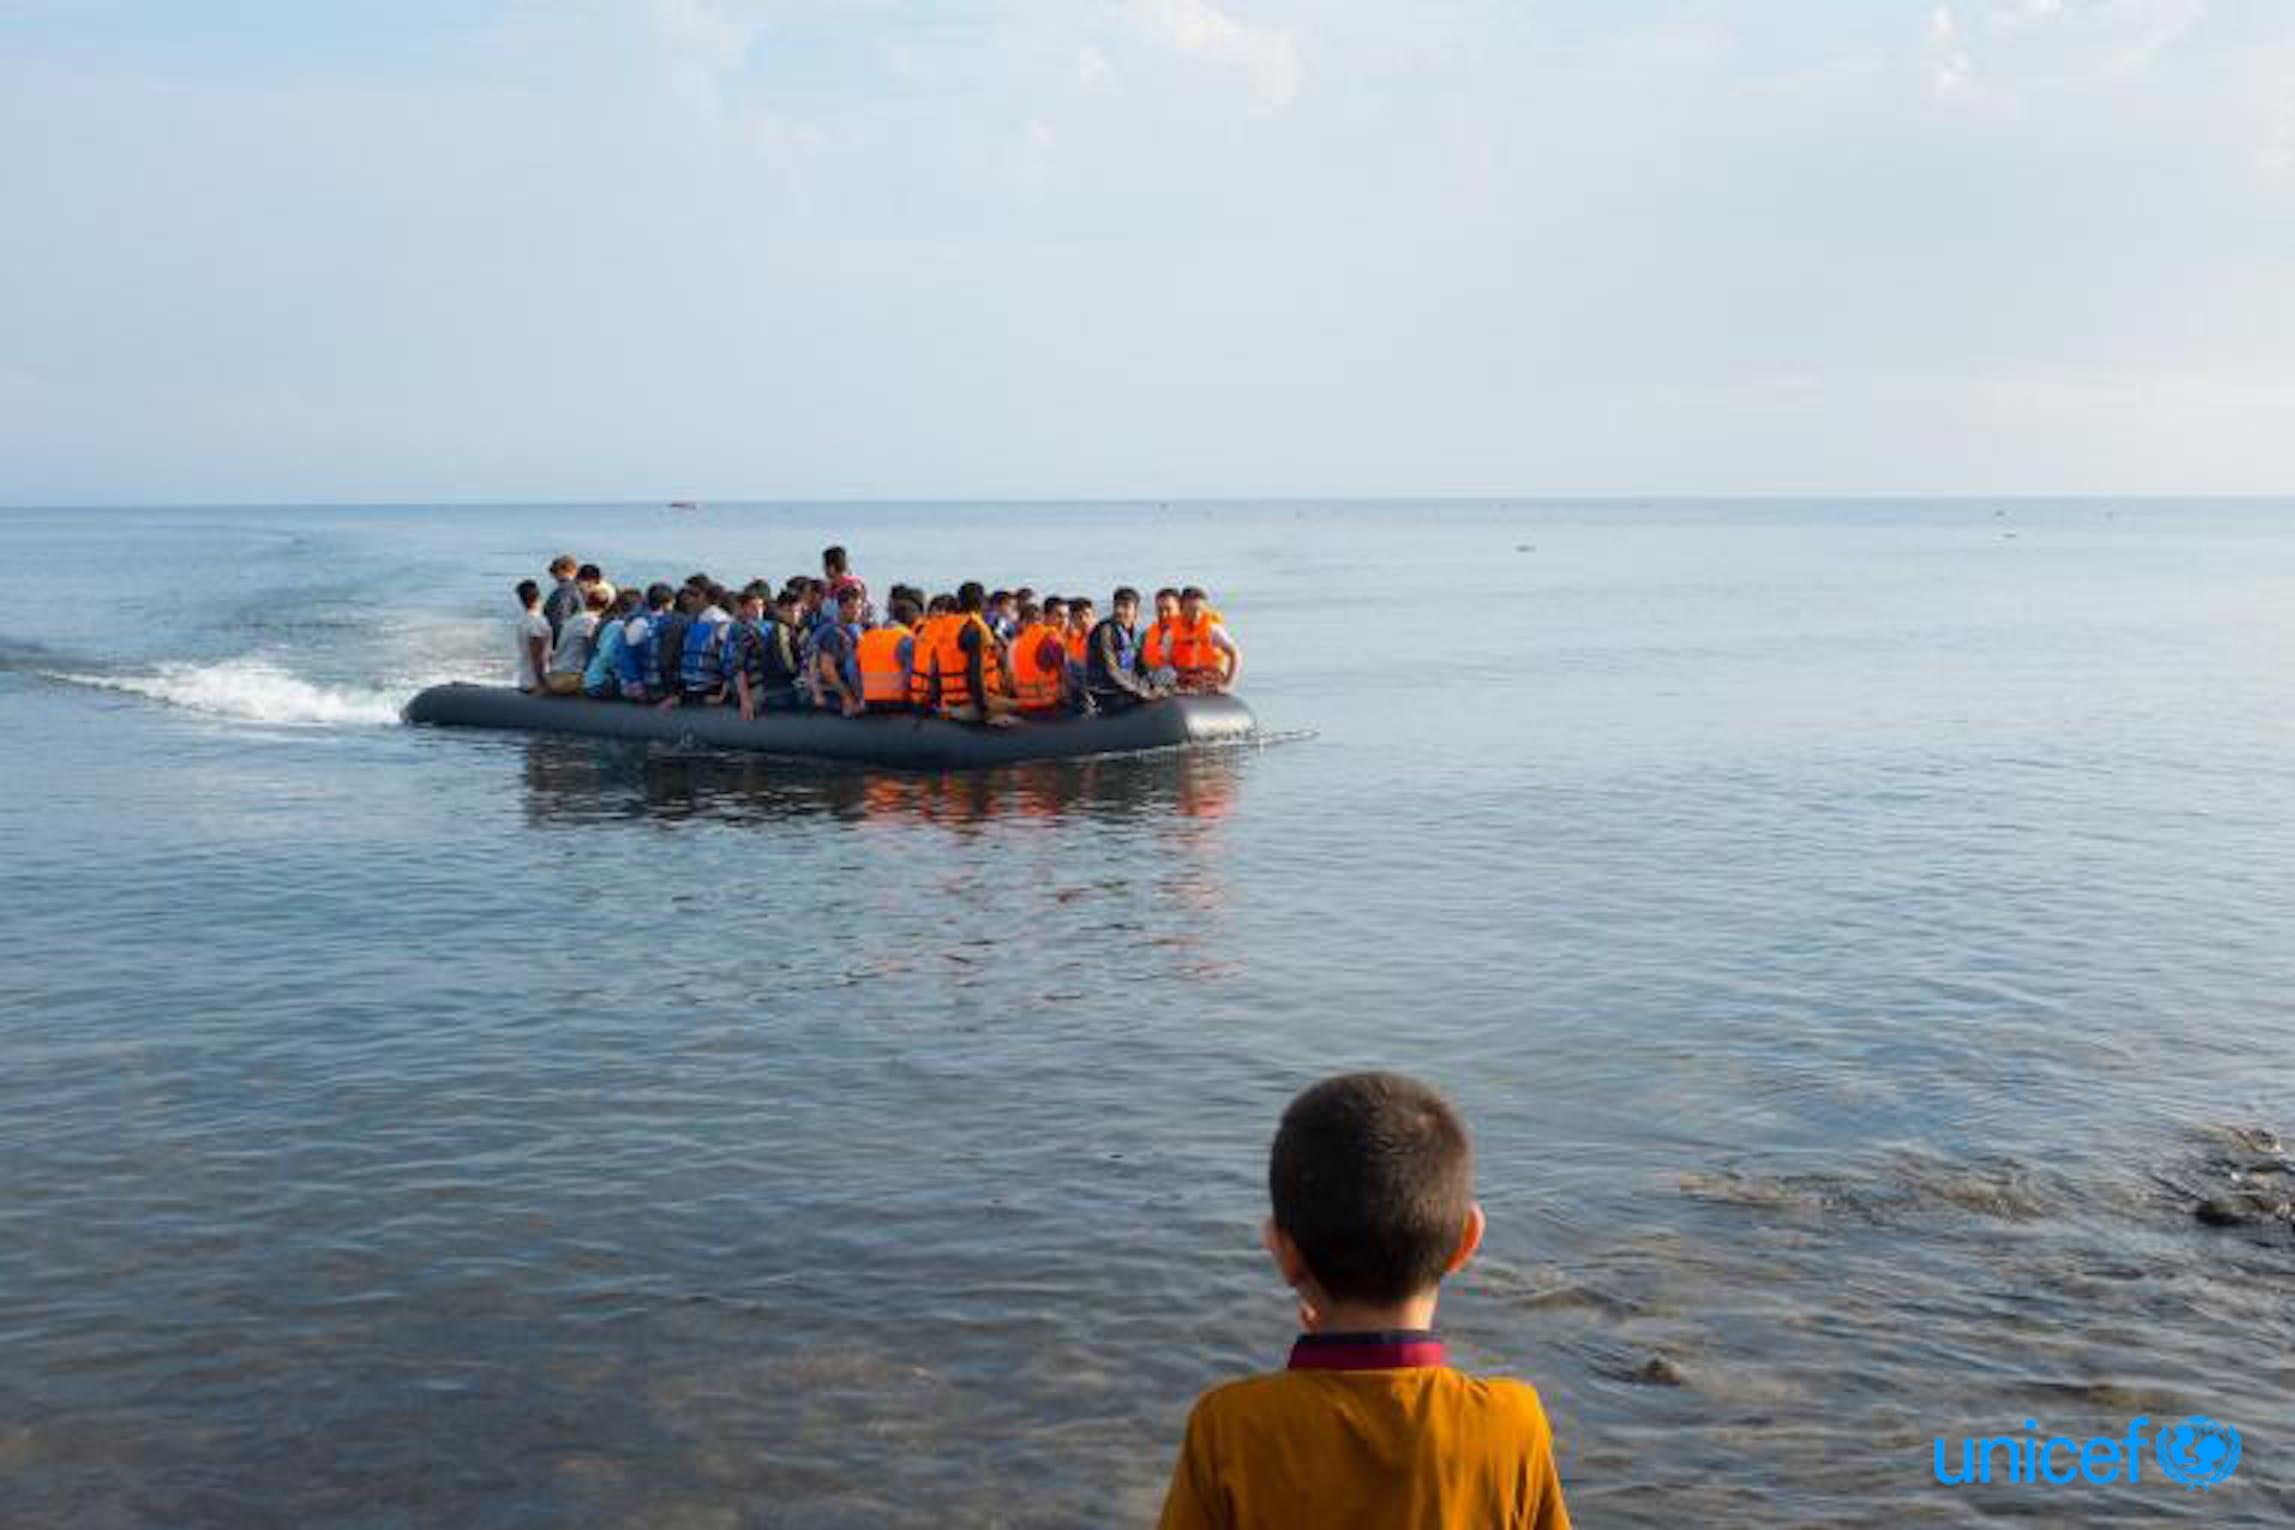 © UNICEF/UNI197236/Gilbertson VII Photo